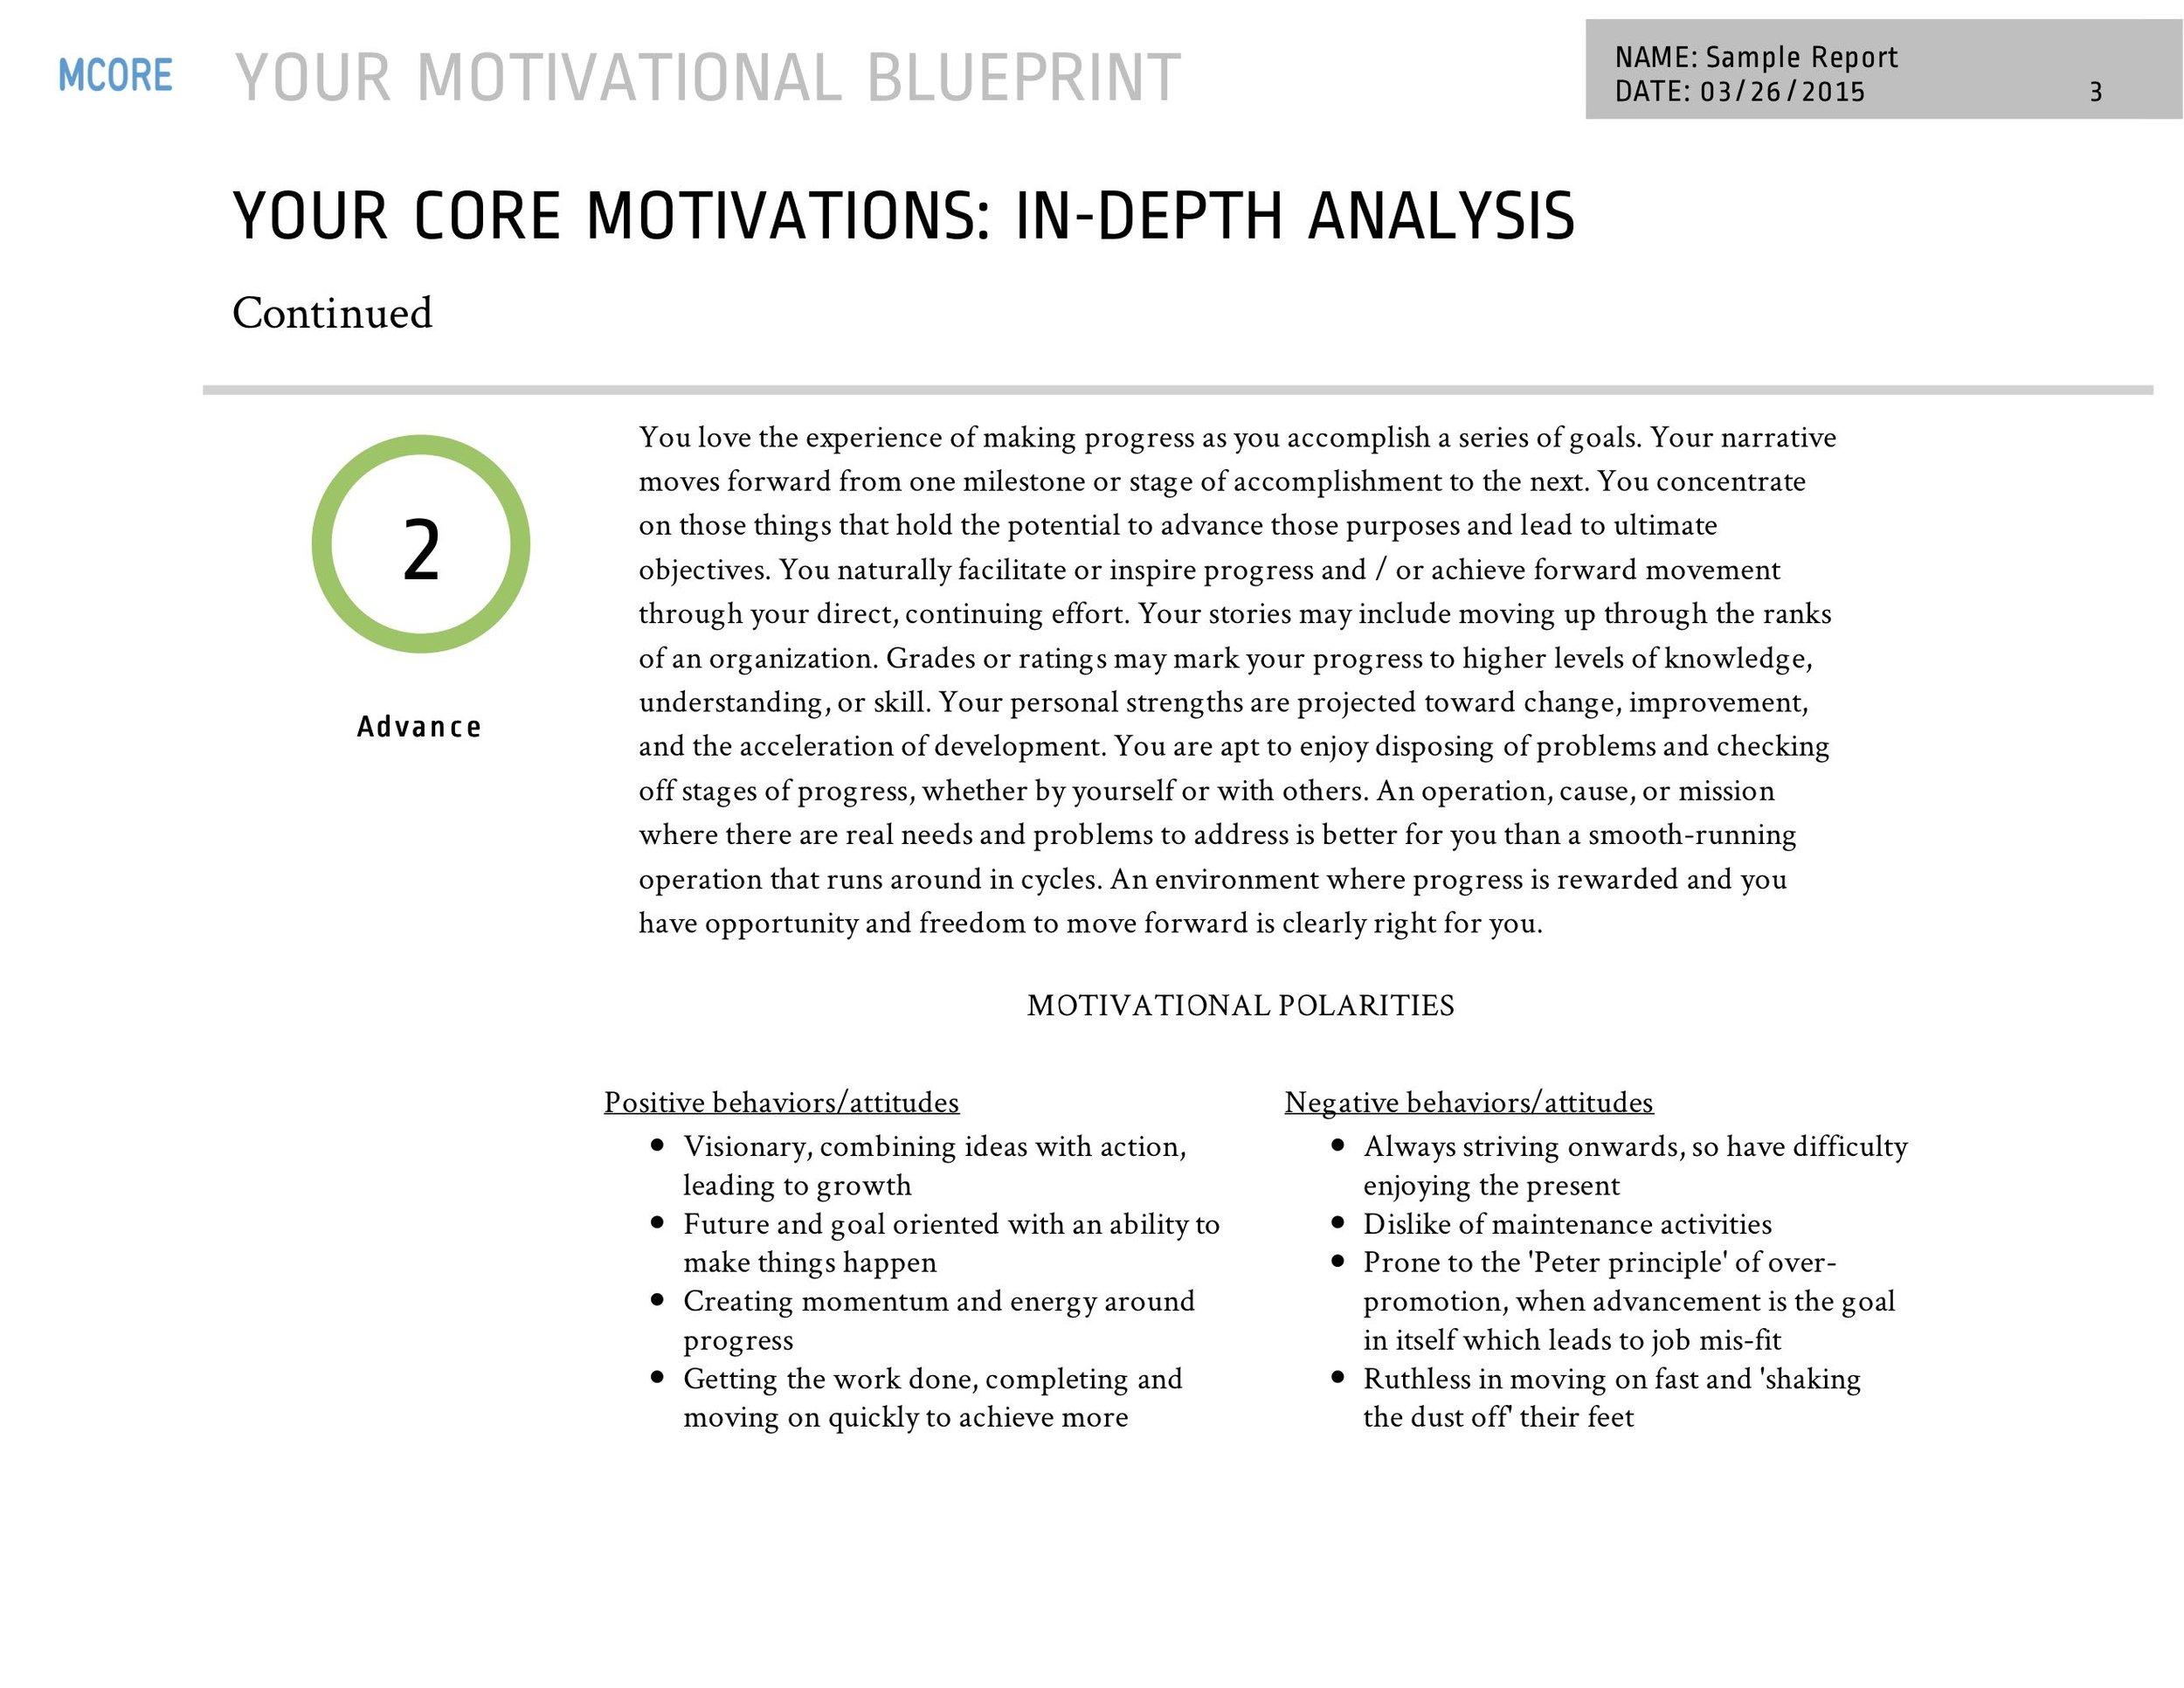 mcore-sample-report-story-solutions-03.jpg